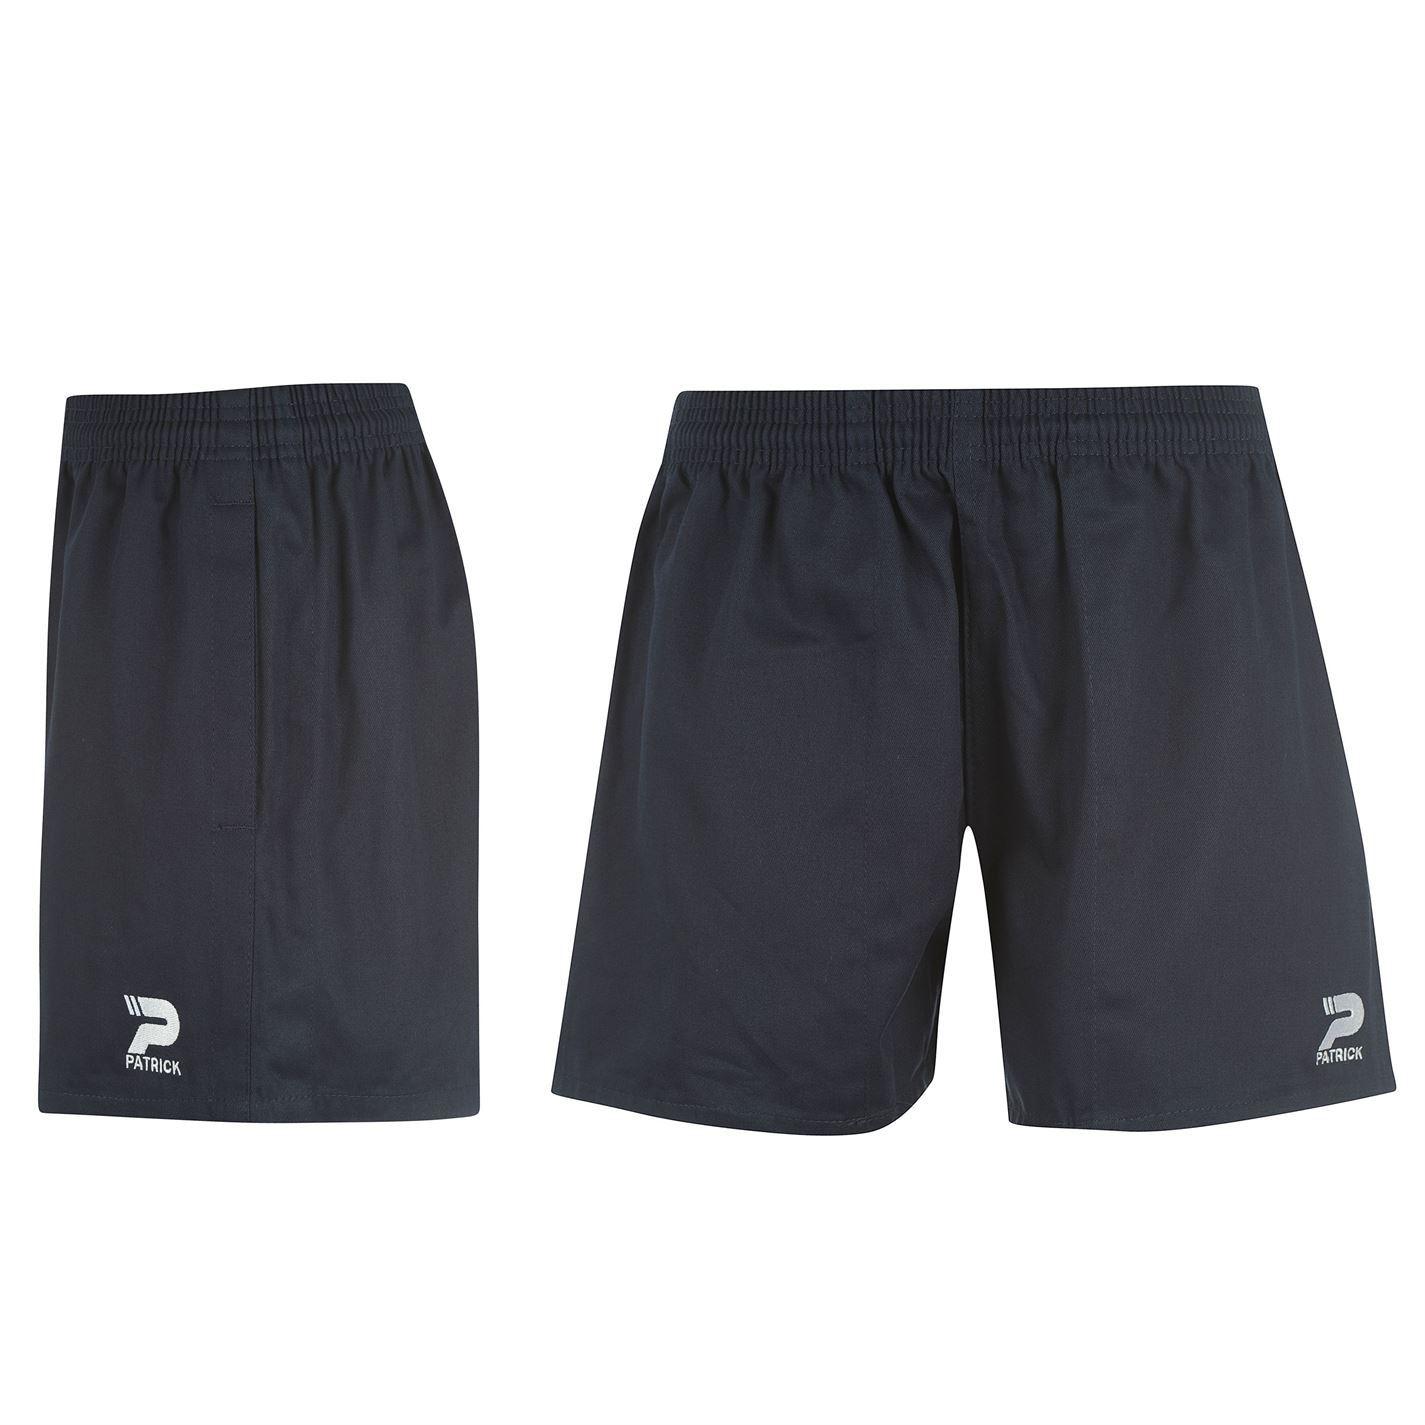 Patrick-Rugby-Shorts-Junior-Boys-Sports-Fan-Bottoms thumbnail 7